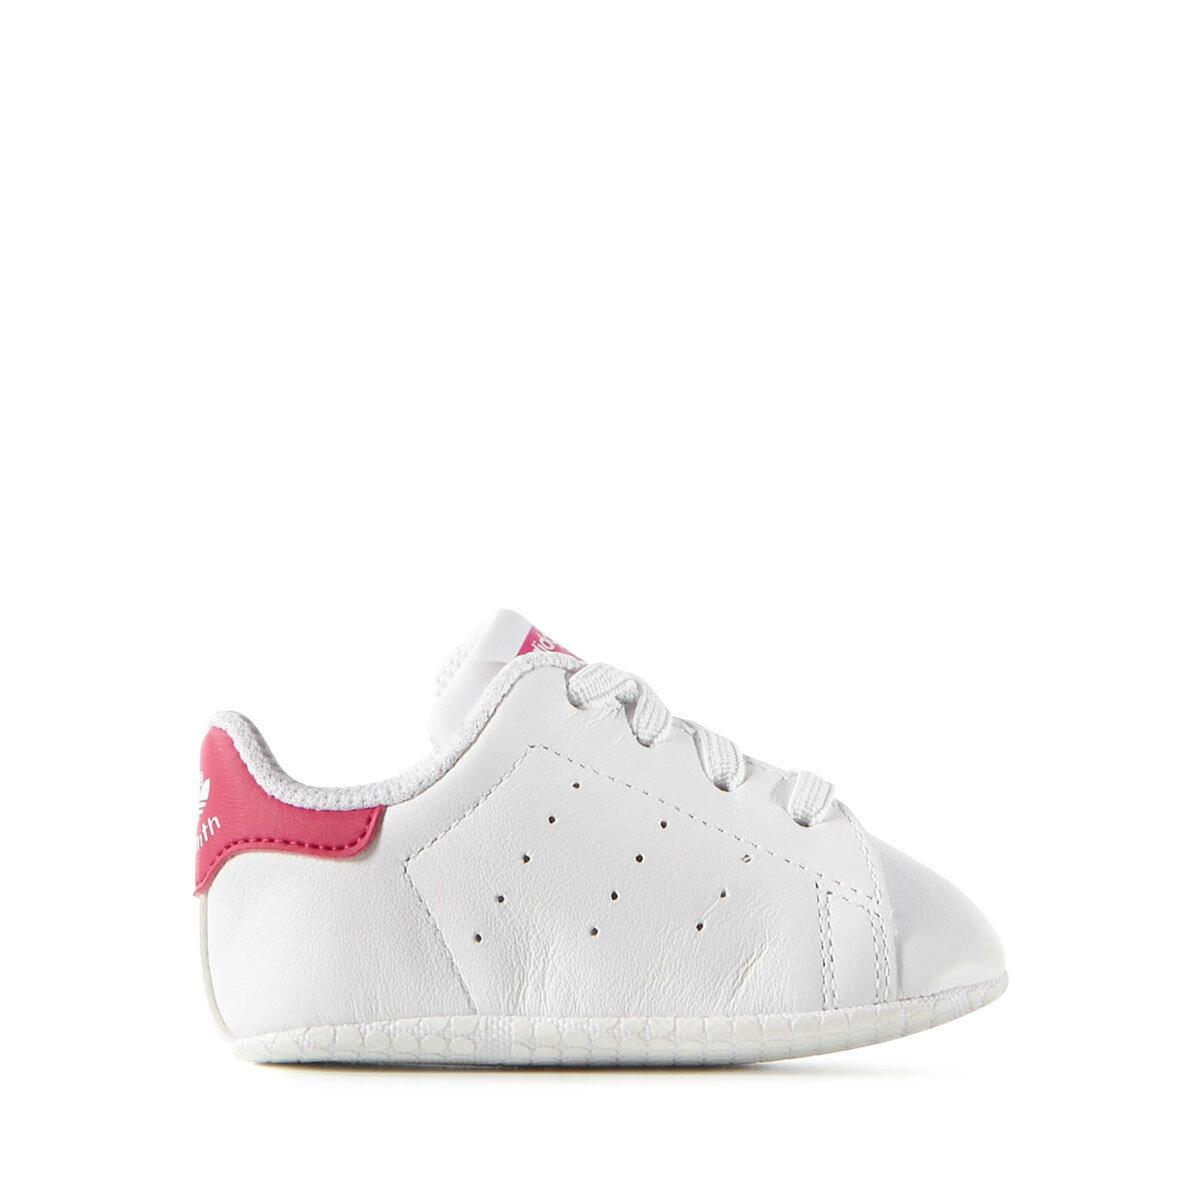 adidas Originals STAN SMITH CRIB(アディダス オリジナルス スタンスミス クリブ)Running White/Running White/Bold Pink【キッズ スニーカー】18SS-I